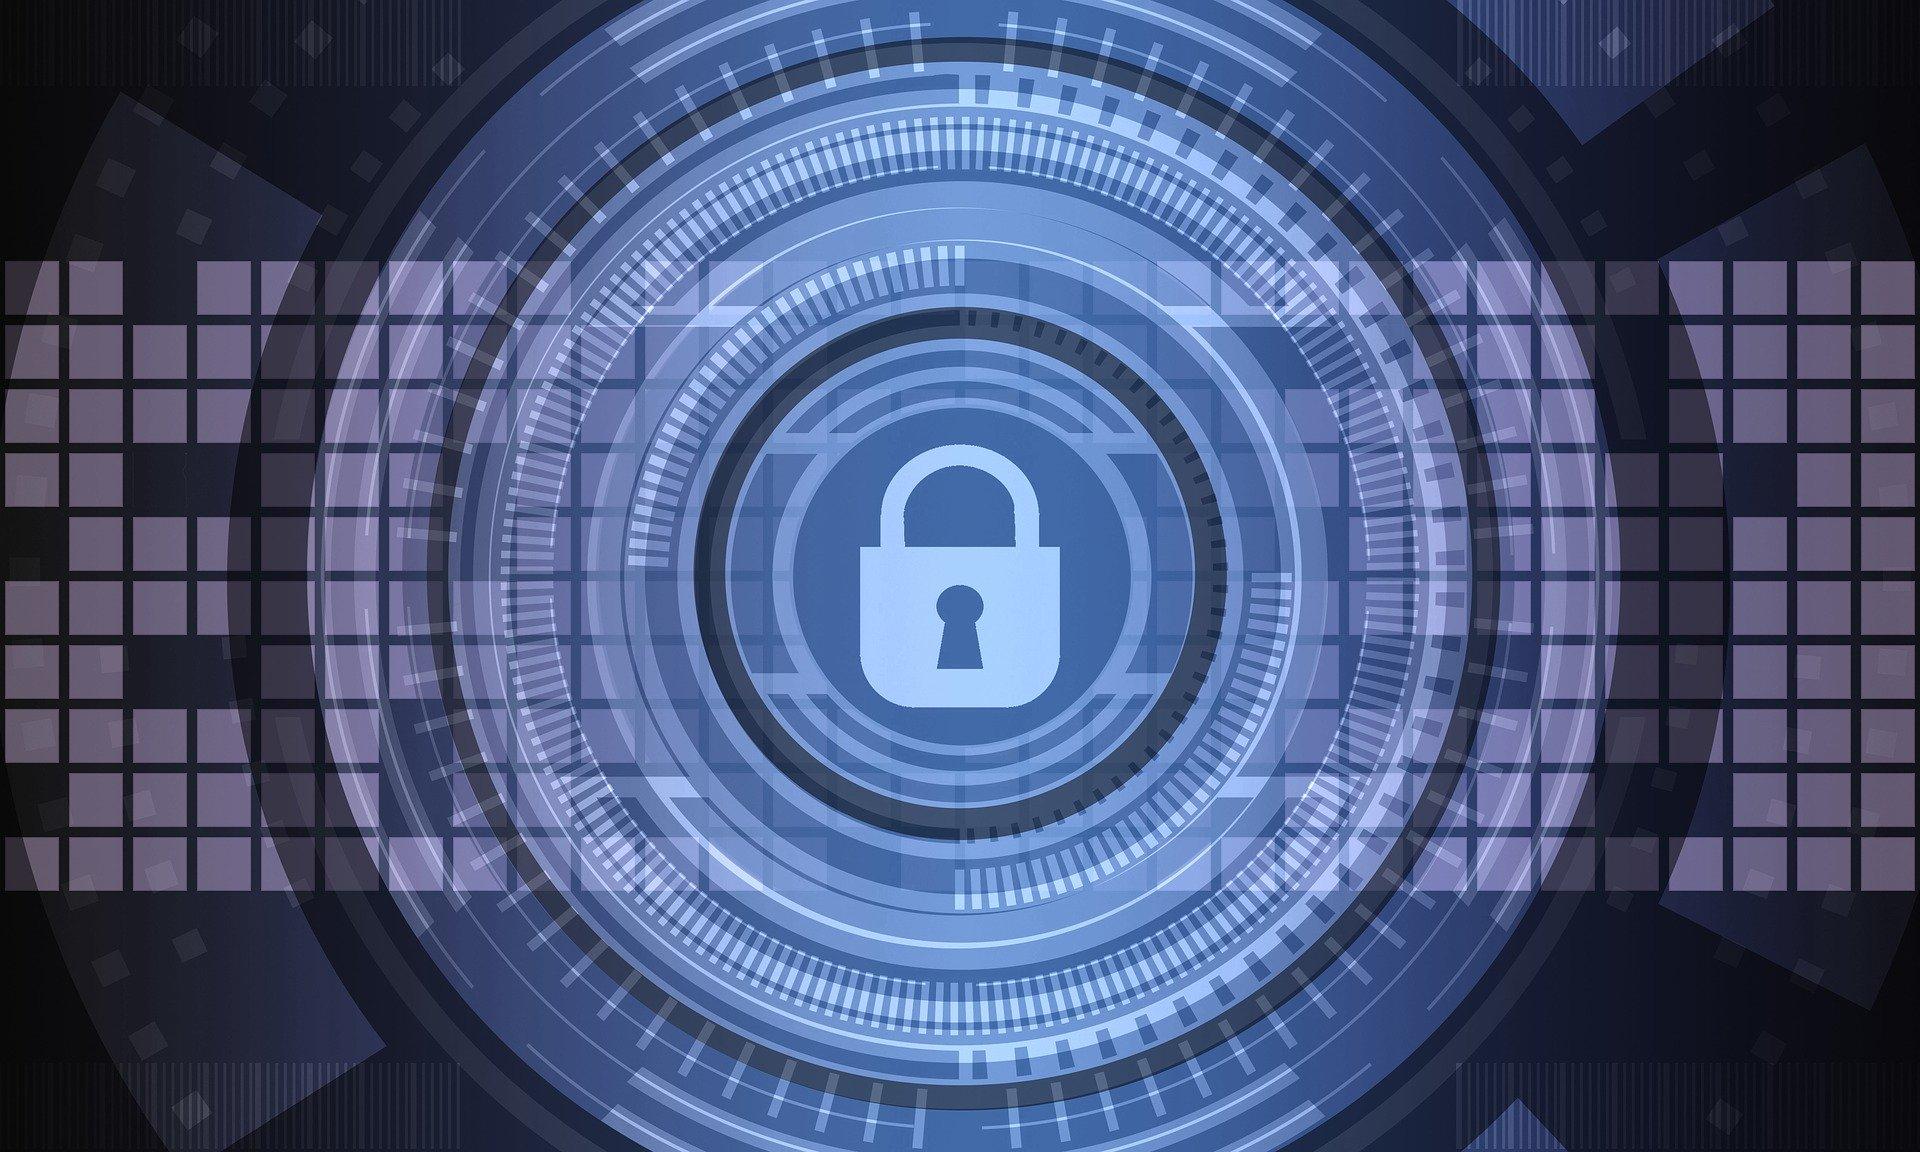 teamlogic-it-plano-tx-cyber-security